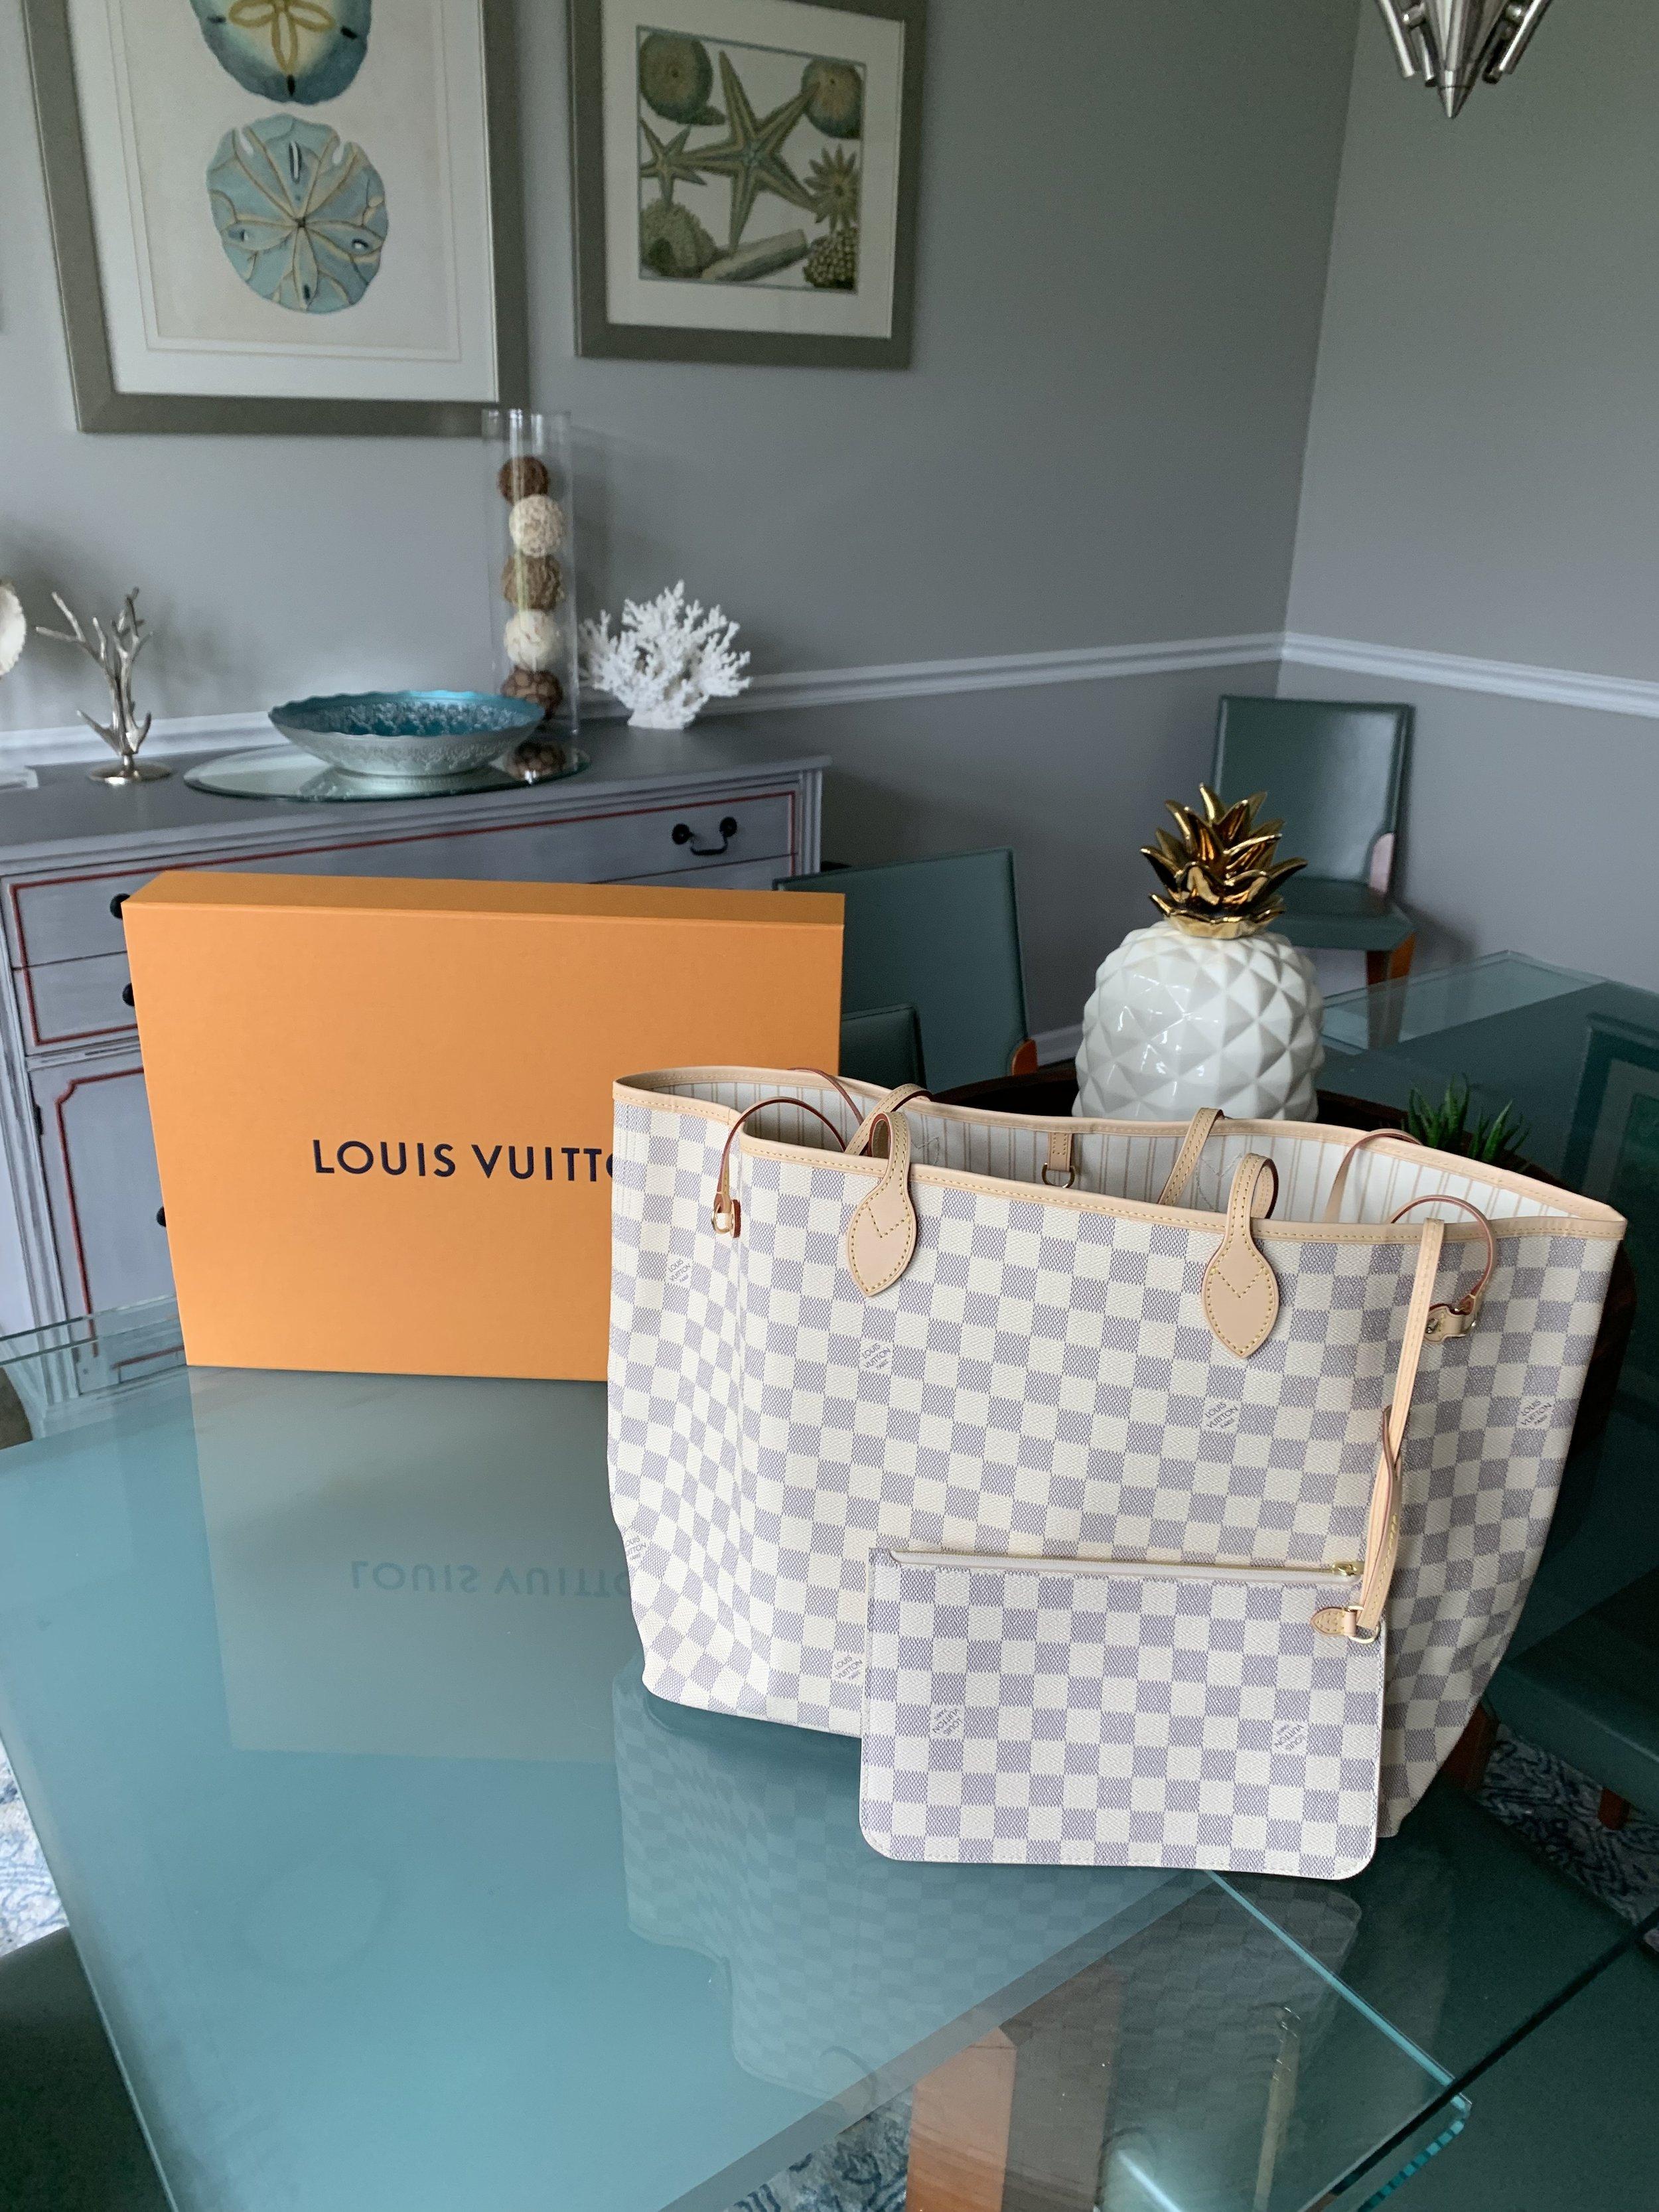 Win me! - Louis Vuitton Never Full Handbag, $1500 value